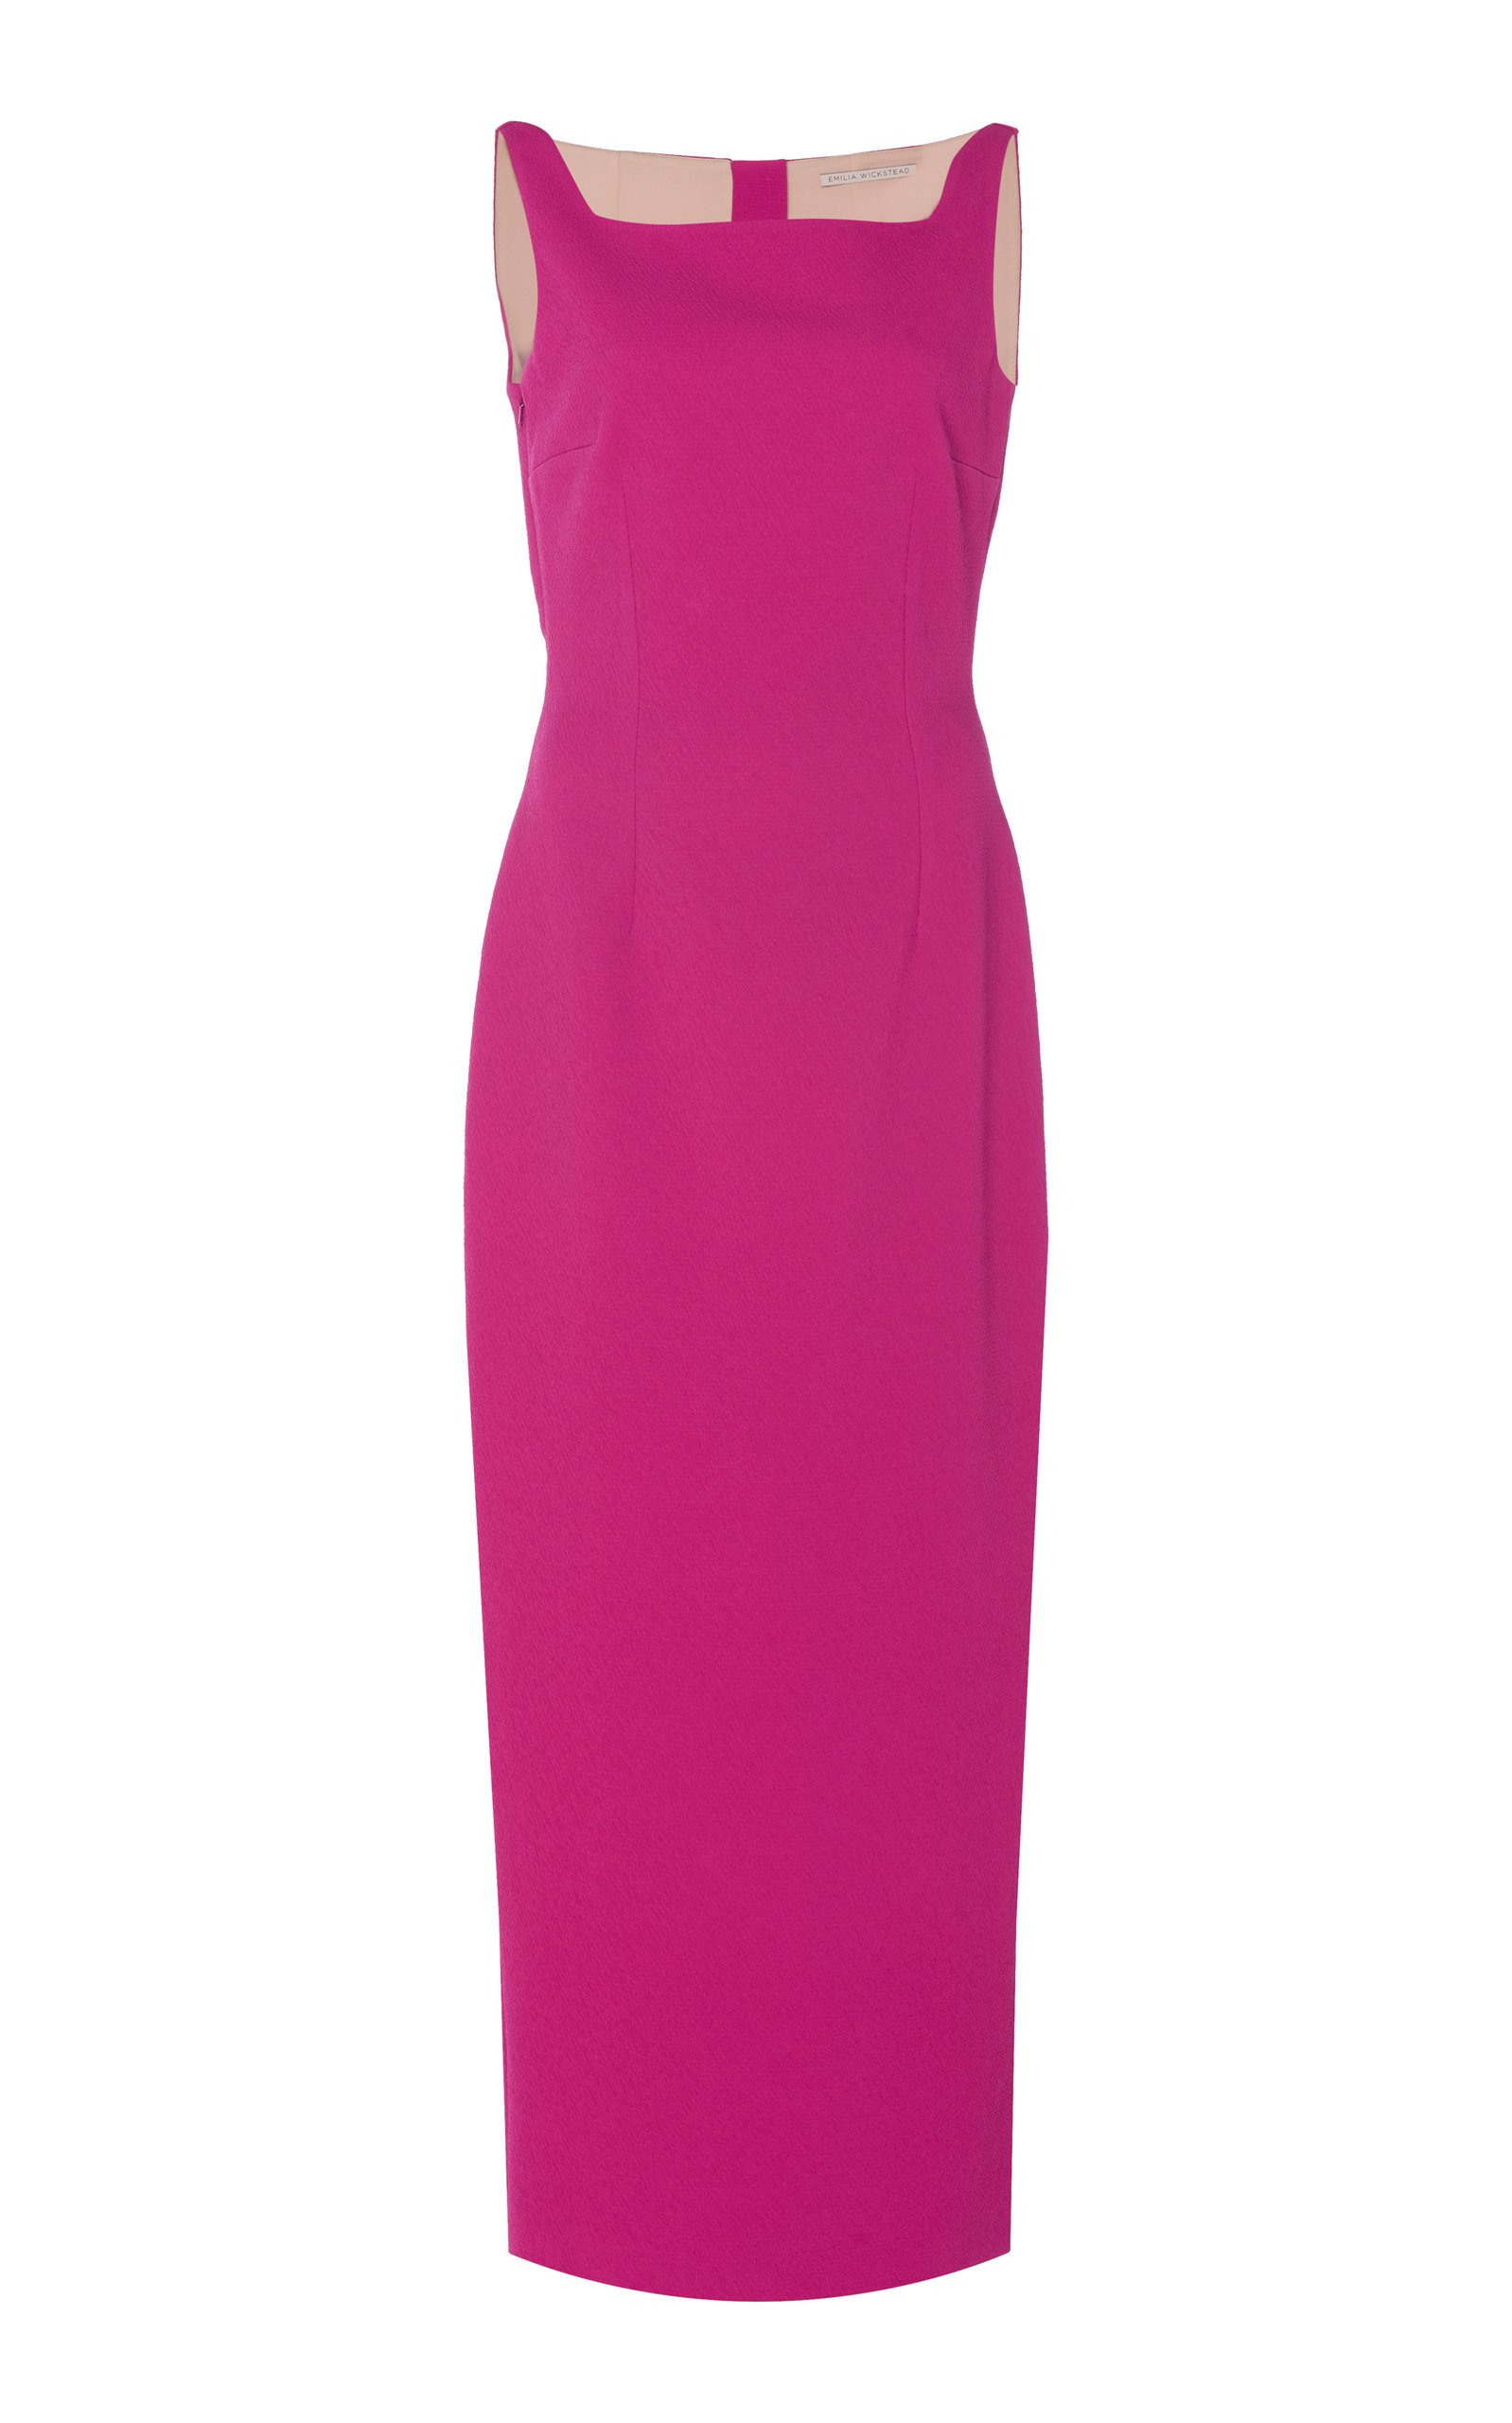 Emilia Wickstead Cleo Sleeveless Cady Midi Dress